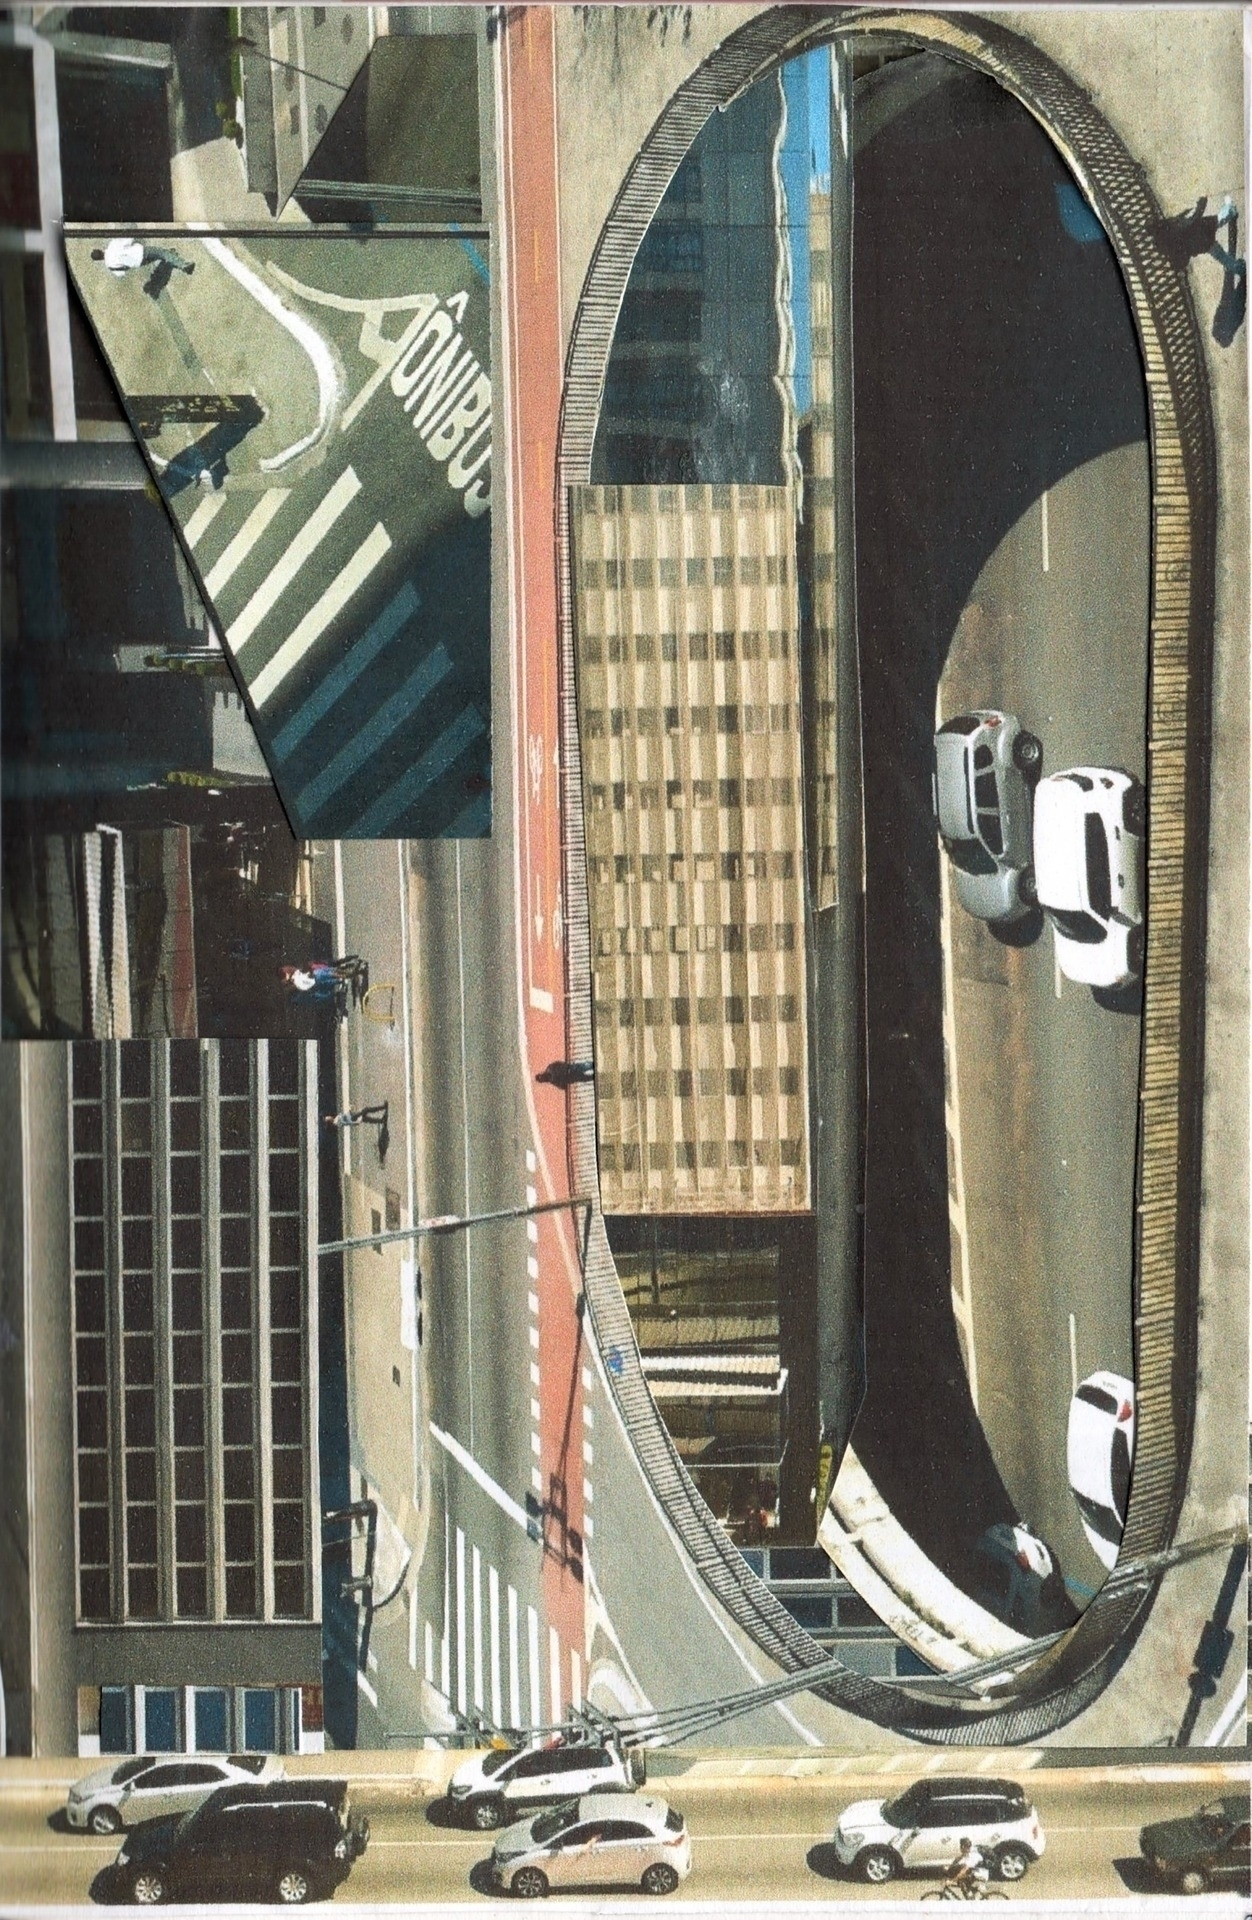 São Paulo - 13:18 - analogcollage - franalvez | ello